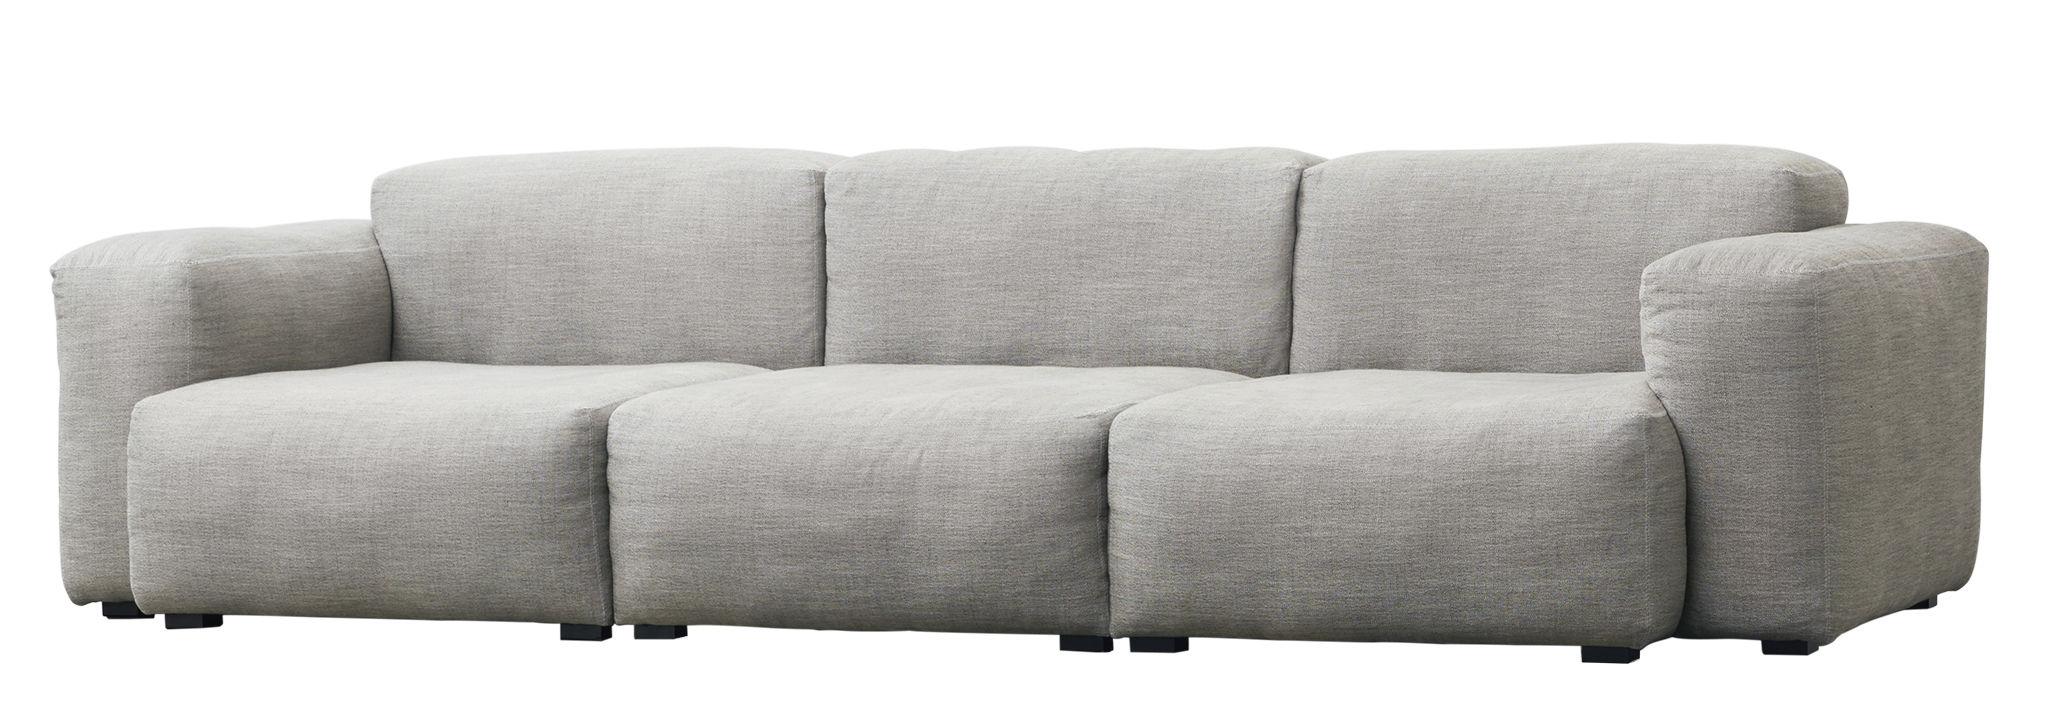 "Möbel - Sofas - Mags Soft Sofa 3-Sitzer / L 268 cm - Stoff ""Ruskin"" - Hay - Hellgrau - Geklebte Kiefer, getönte Kiefer, Polyurethan-Schaum, Stoff Ruskin"